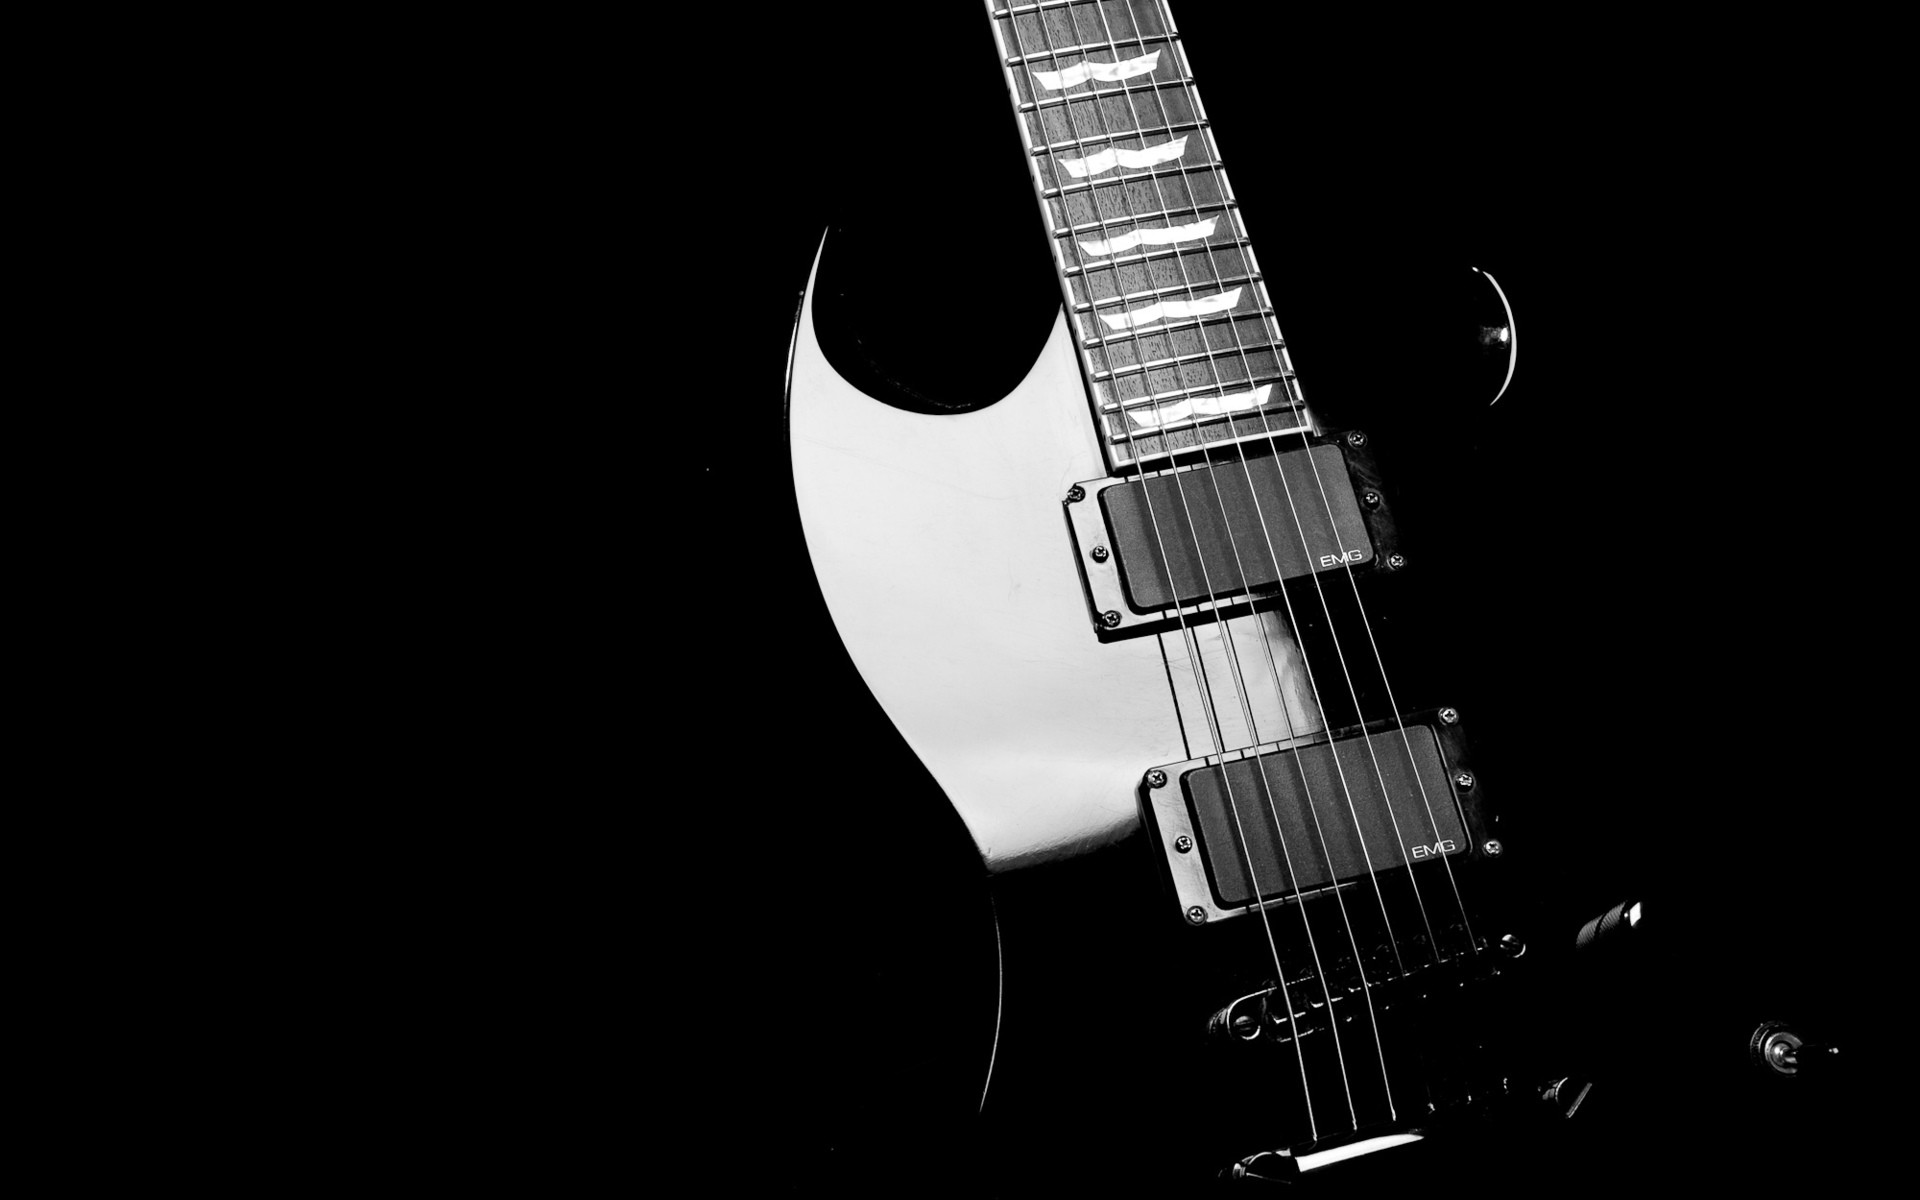 Acoustic Guitar Desktop Wallpapers HD Wallpapers Pop 1920×1080 Guitar  Wallpapers Download (52 Wallpapers) | Adorable Wallpapers | Wallpapers |  Pinterest …